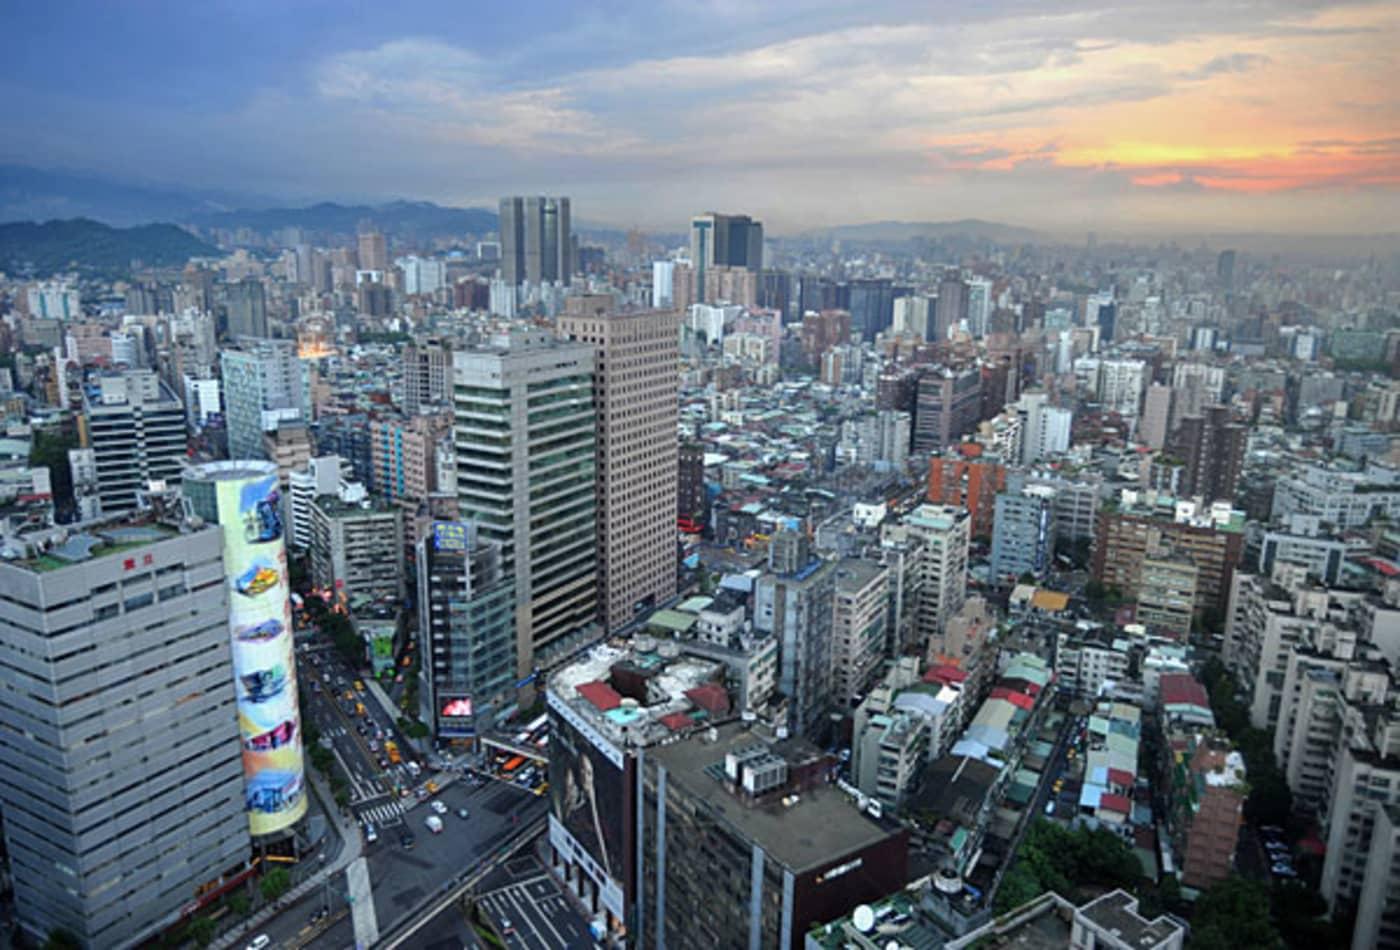 6_Taiwan.jpg